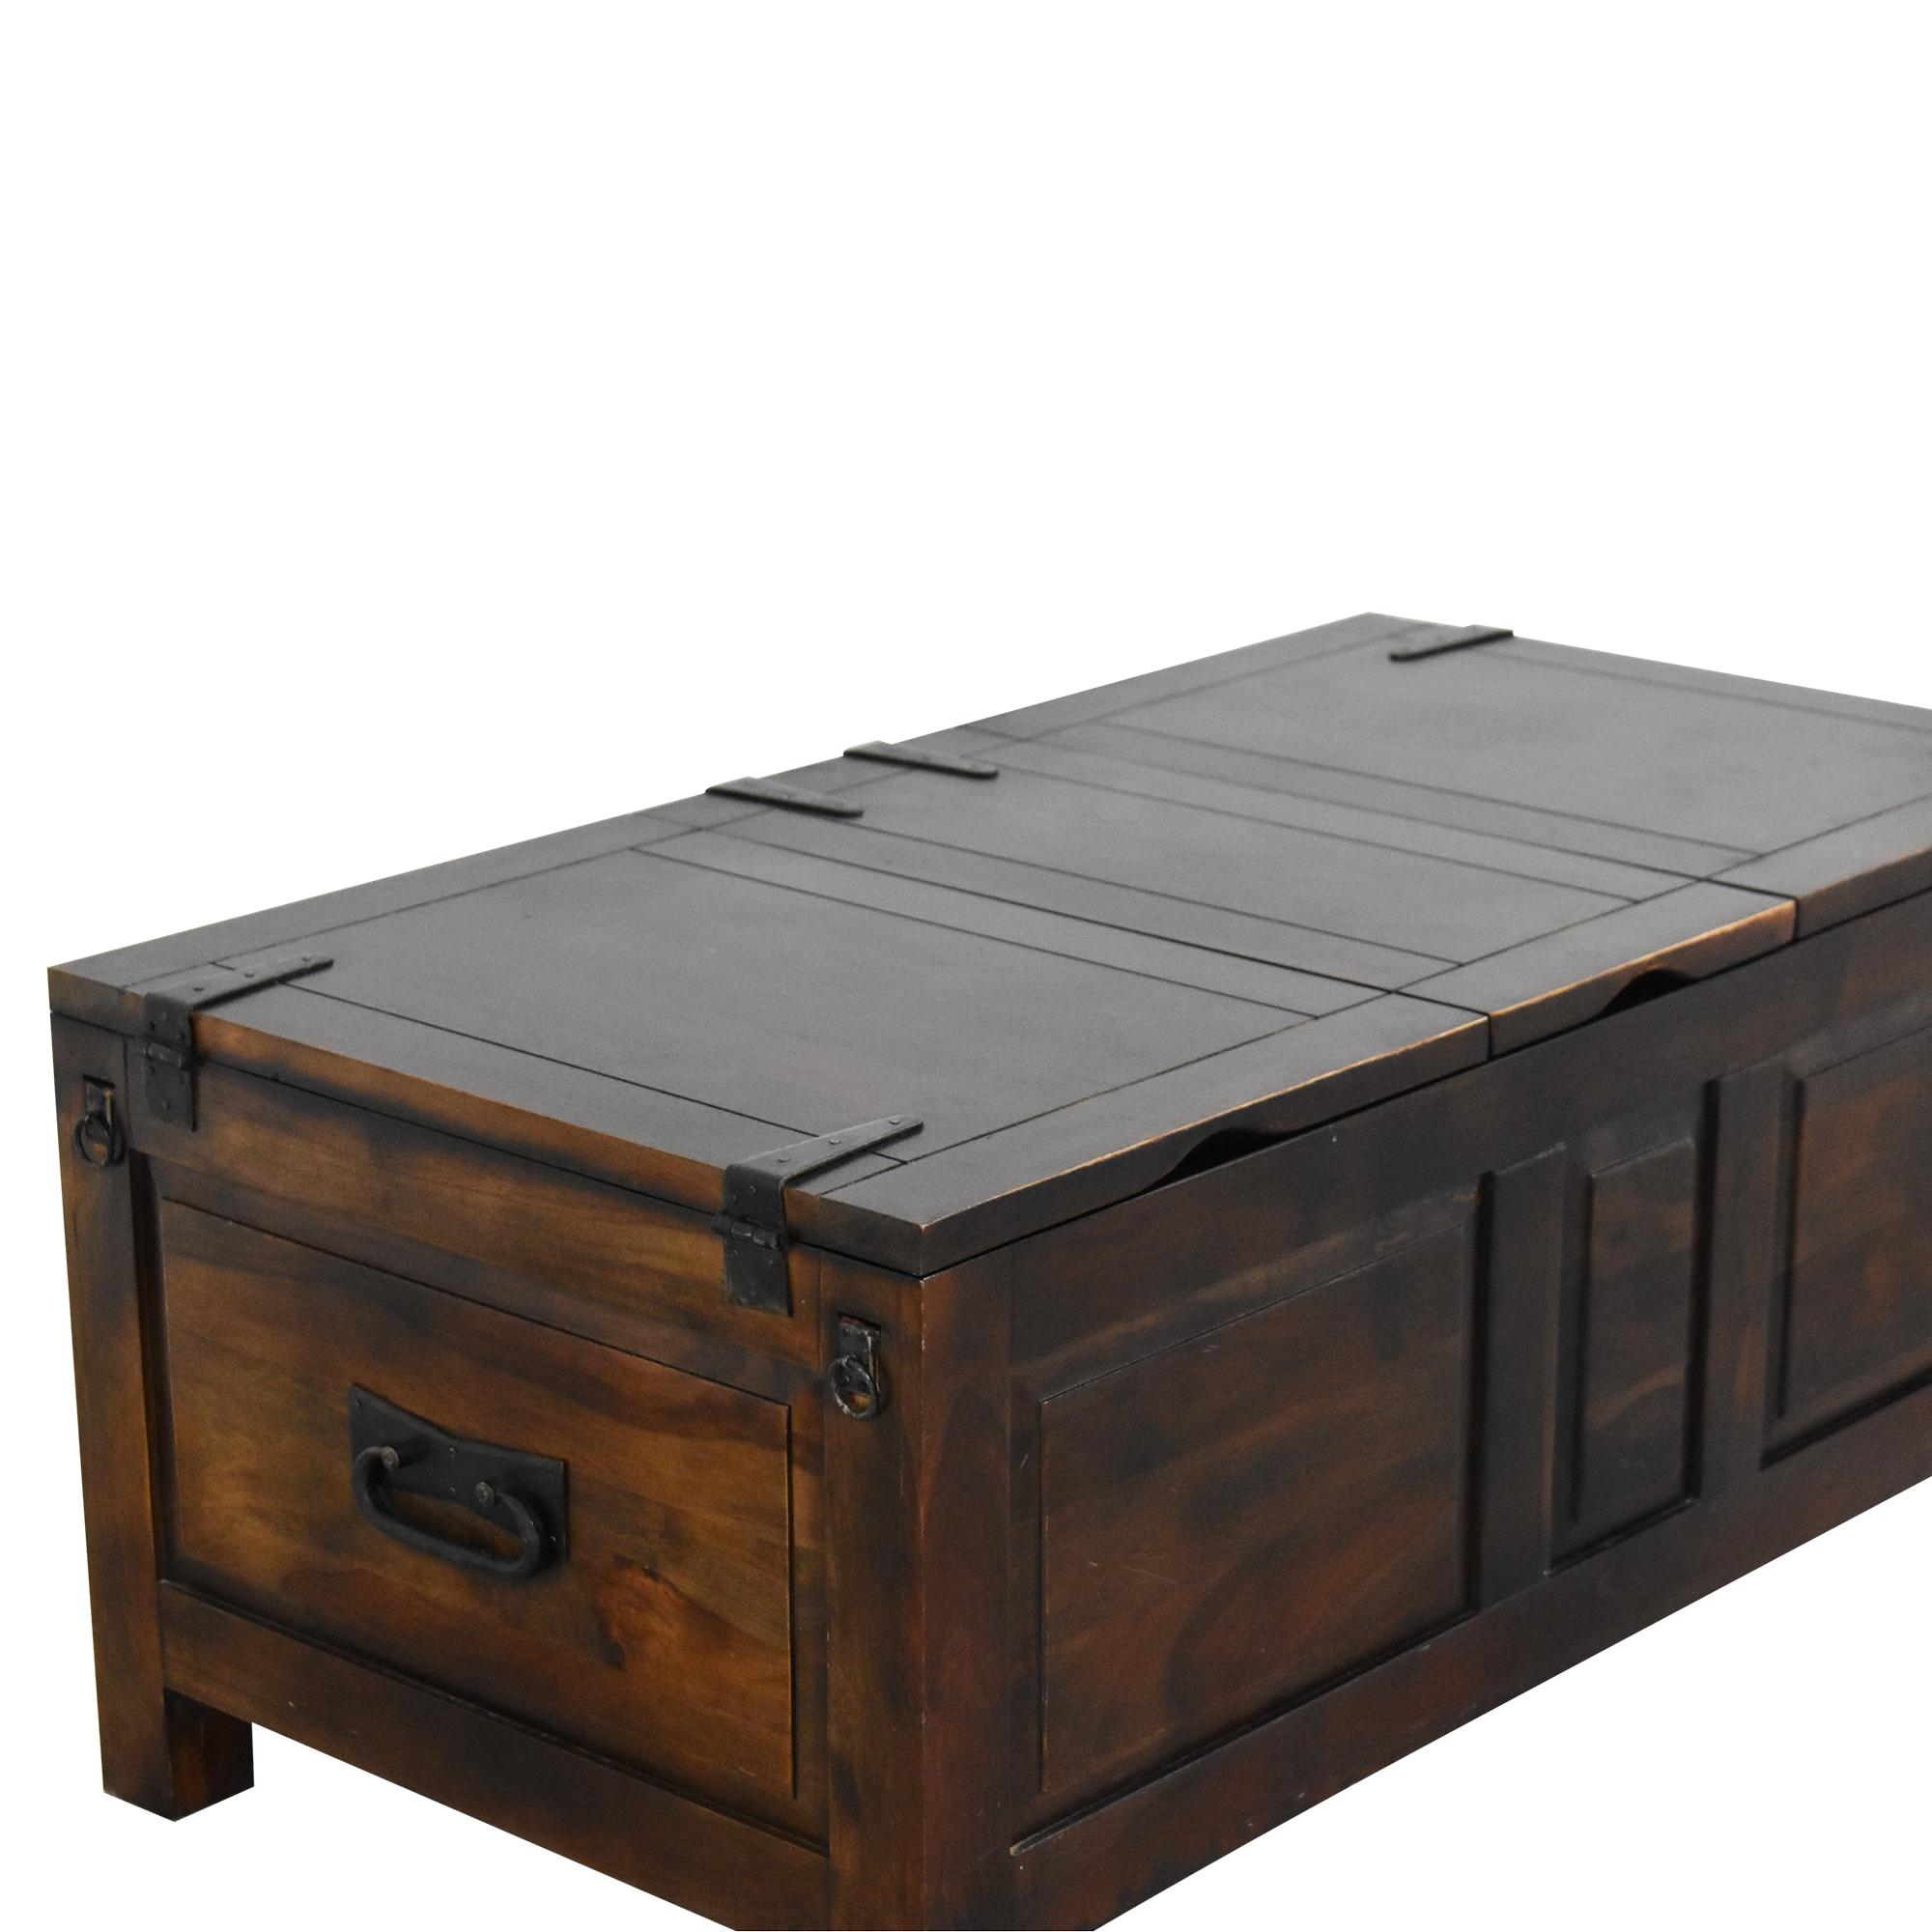 buy Crate & Barrel Crate & Barrel Hunter II Trunk Storage Coffee Table online